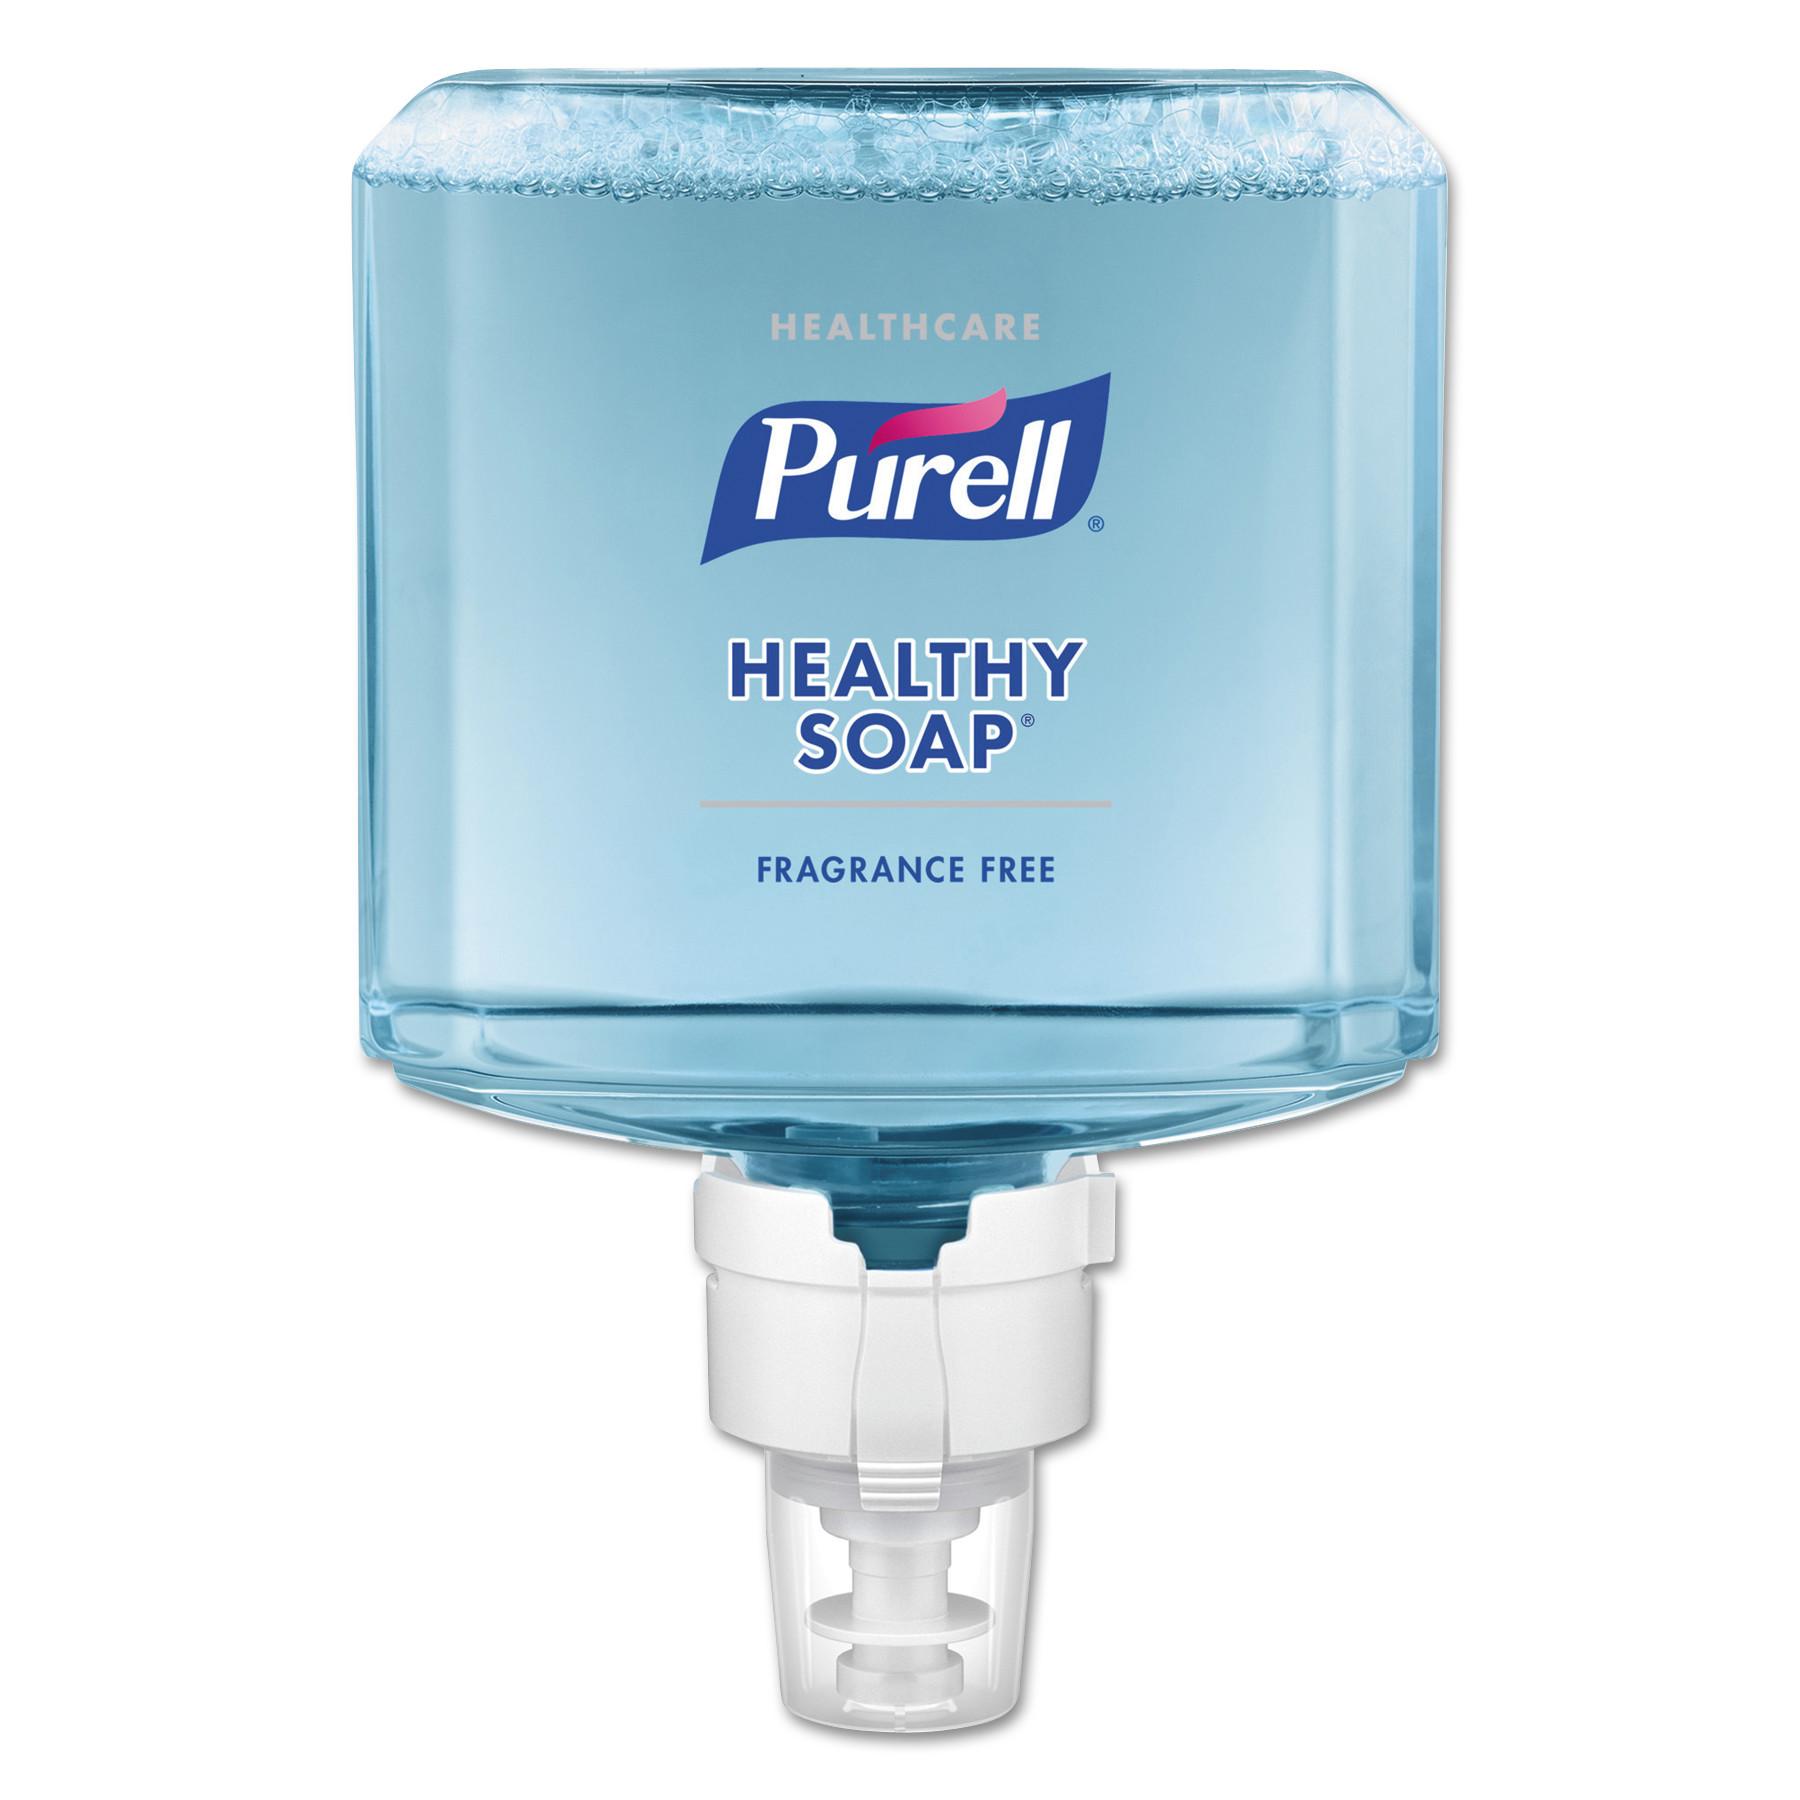 Healthcare HEALTHY SOAP Gentle & Free Foam ES8 Refill, 1200 mL, 2/CT